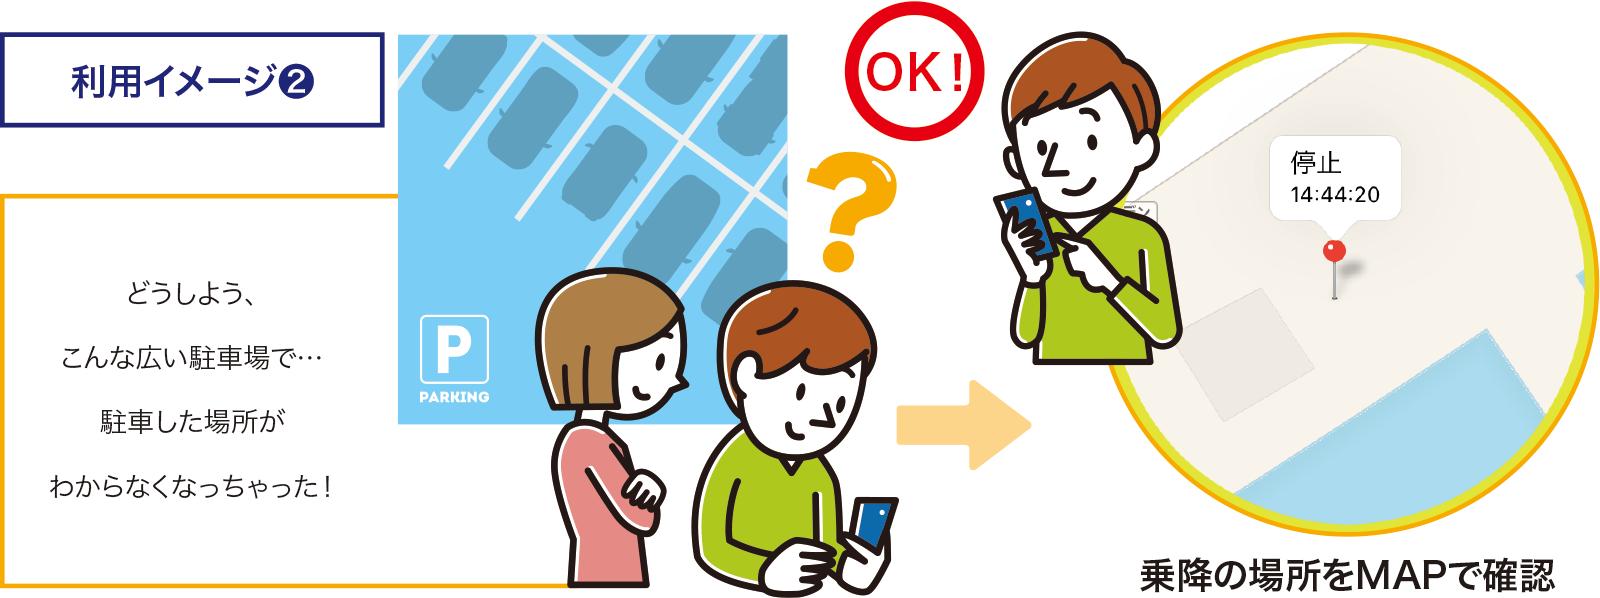 How to Use 乗り物検知アプリRide! (ライド!)